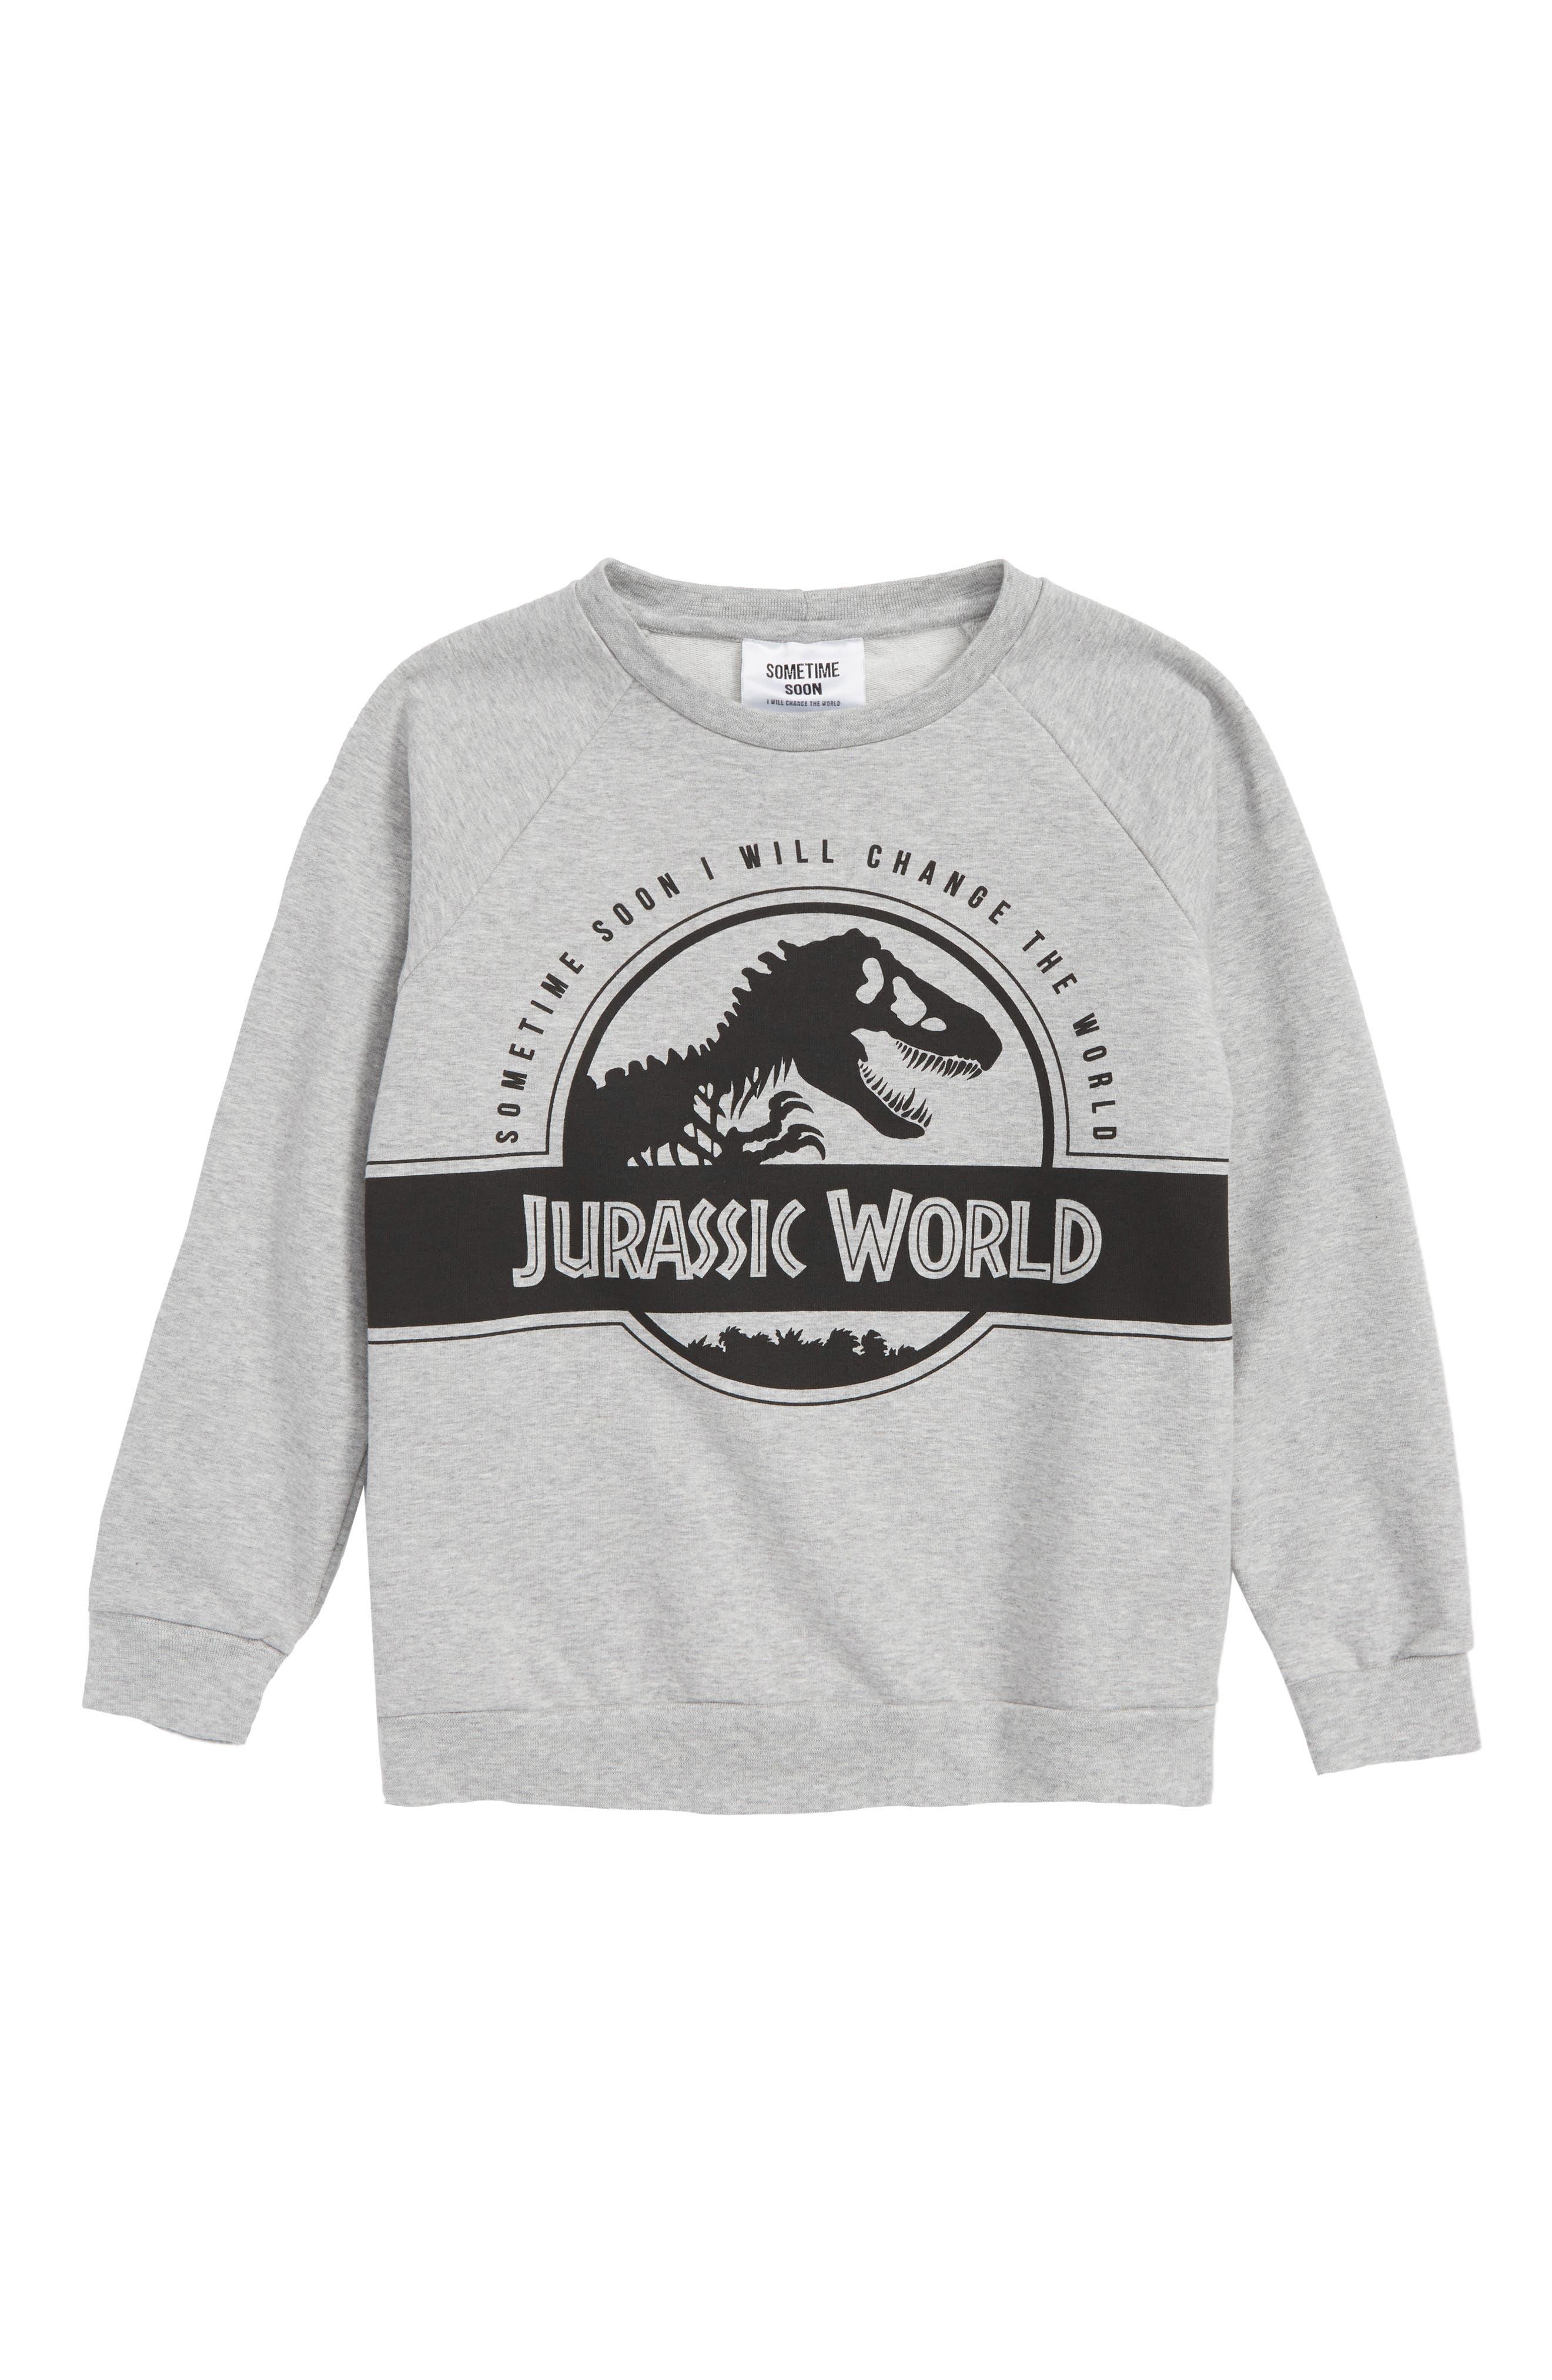 x Jurassic World Rex Graphic Organic Cotton Sweatshirt,                         Main,                         color, Grey Melange